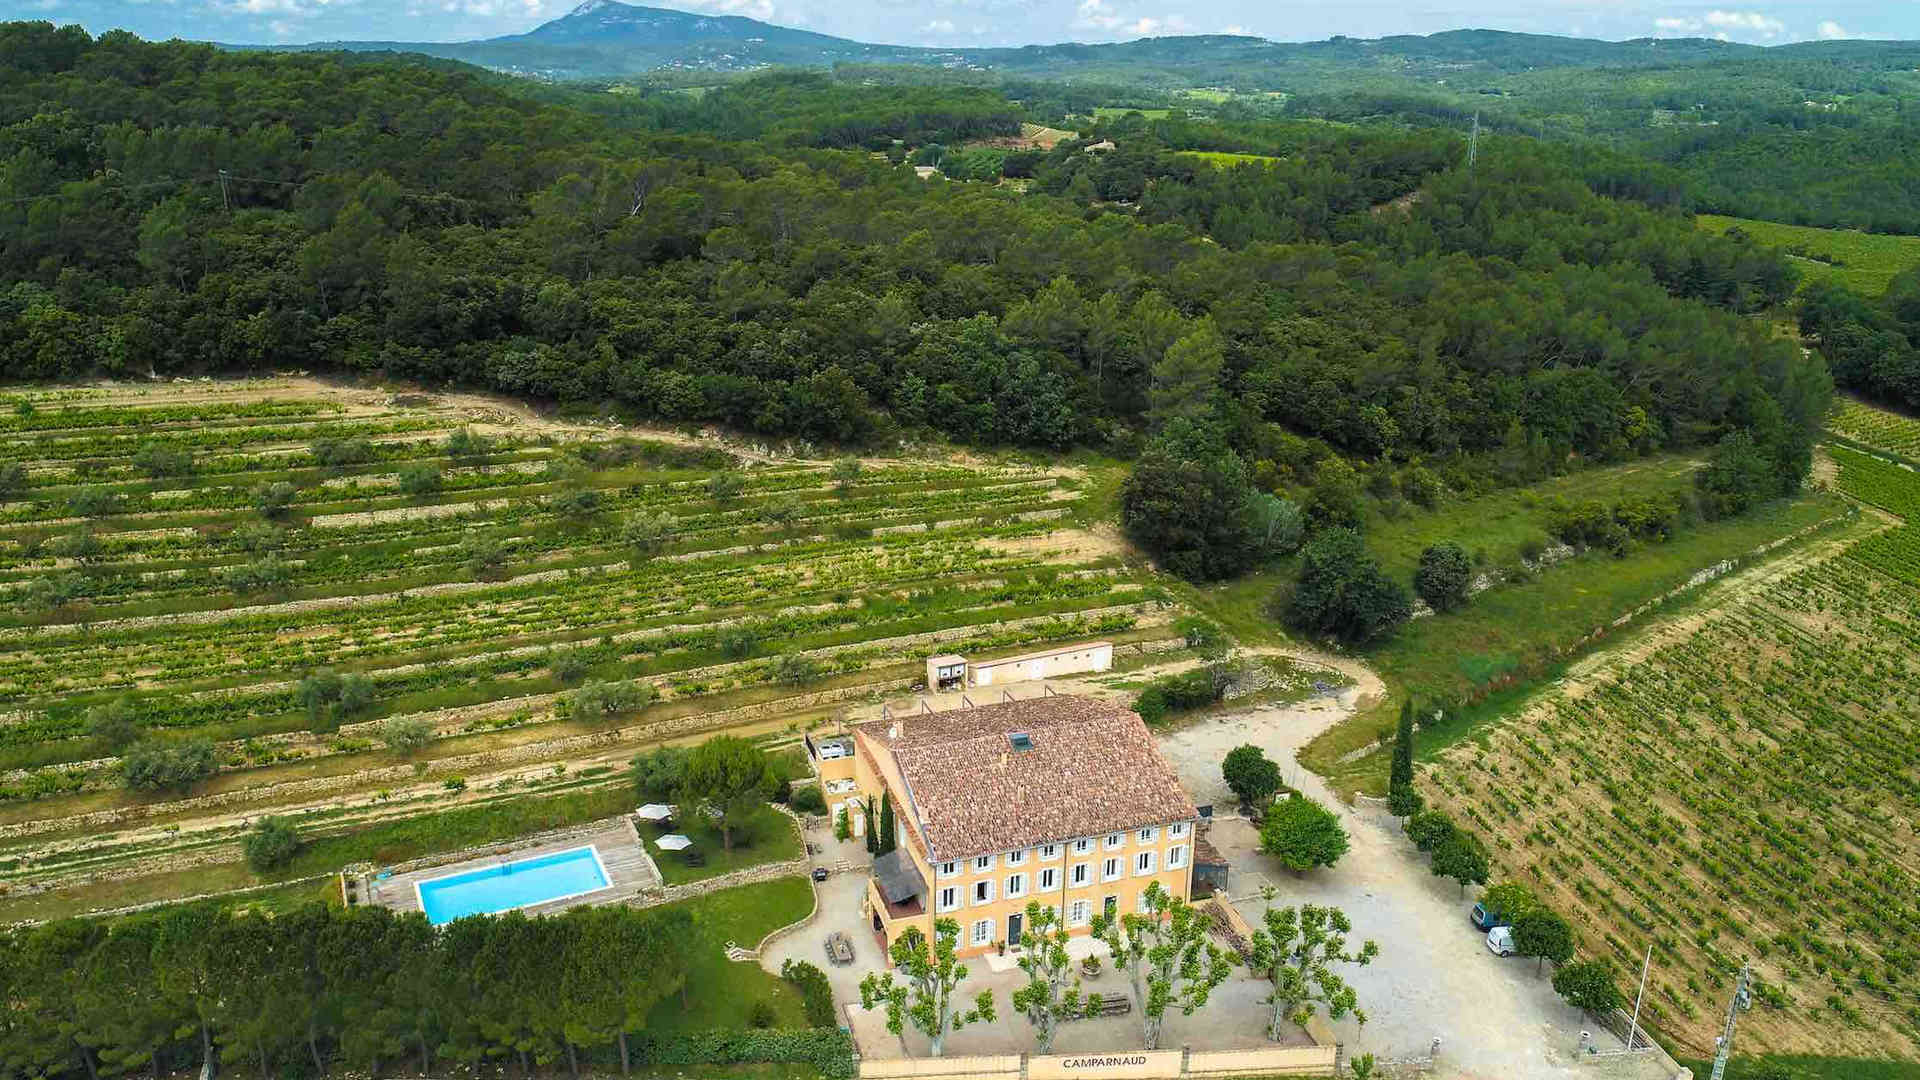 Camparnaud Provence holiday